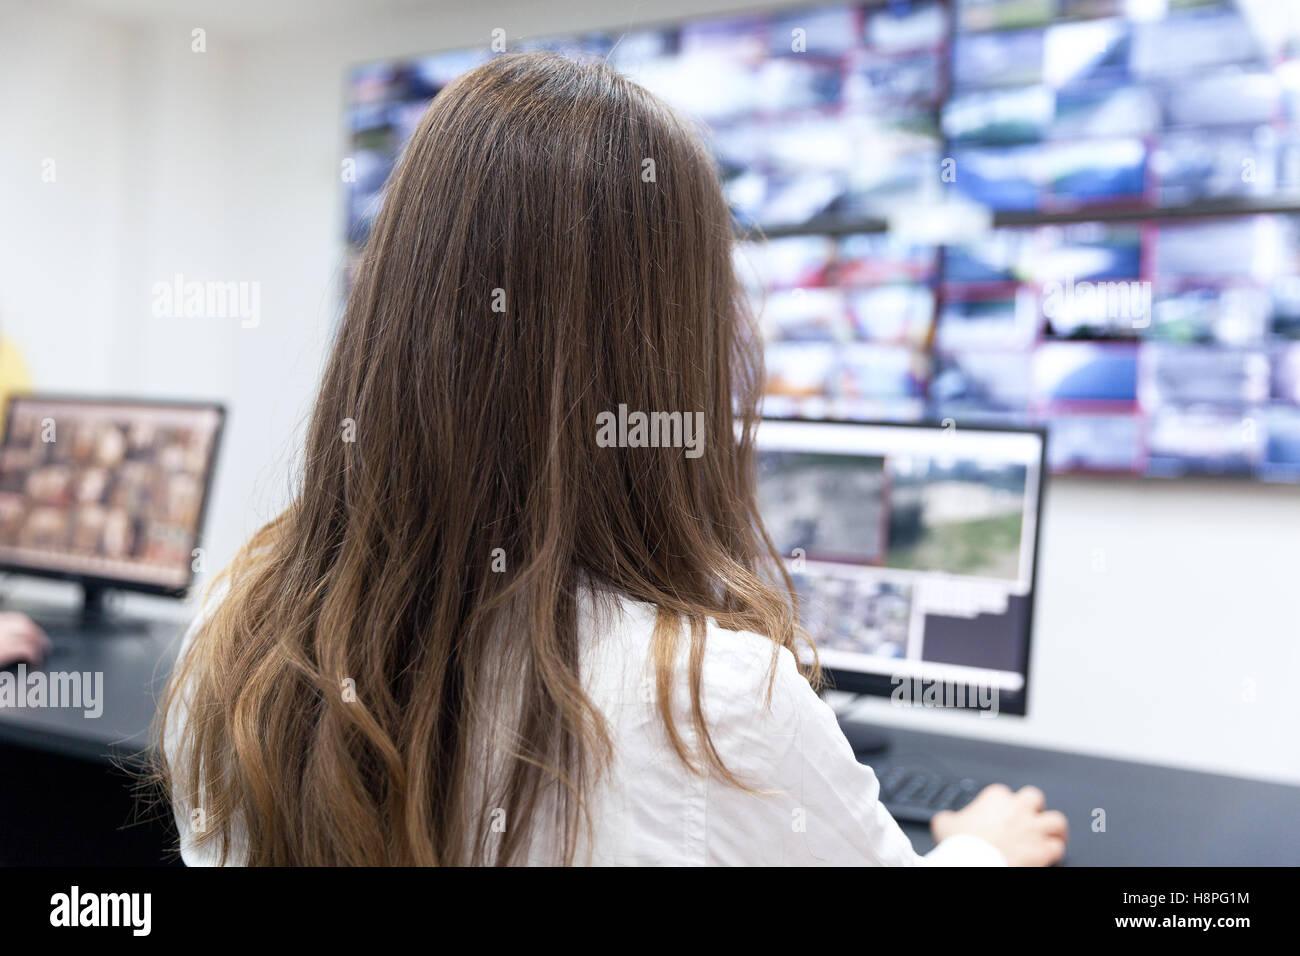 Control room operator. Security video surveillance. - Stock Image